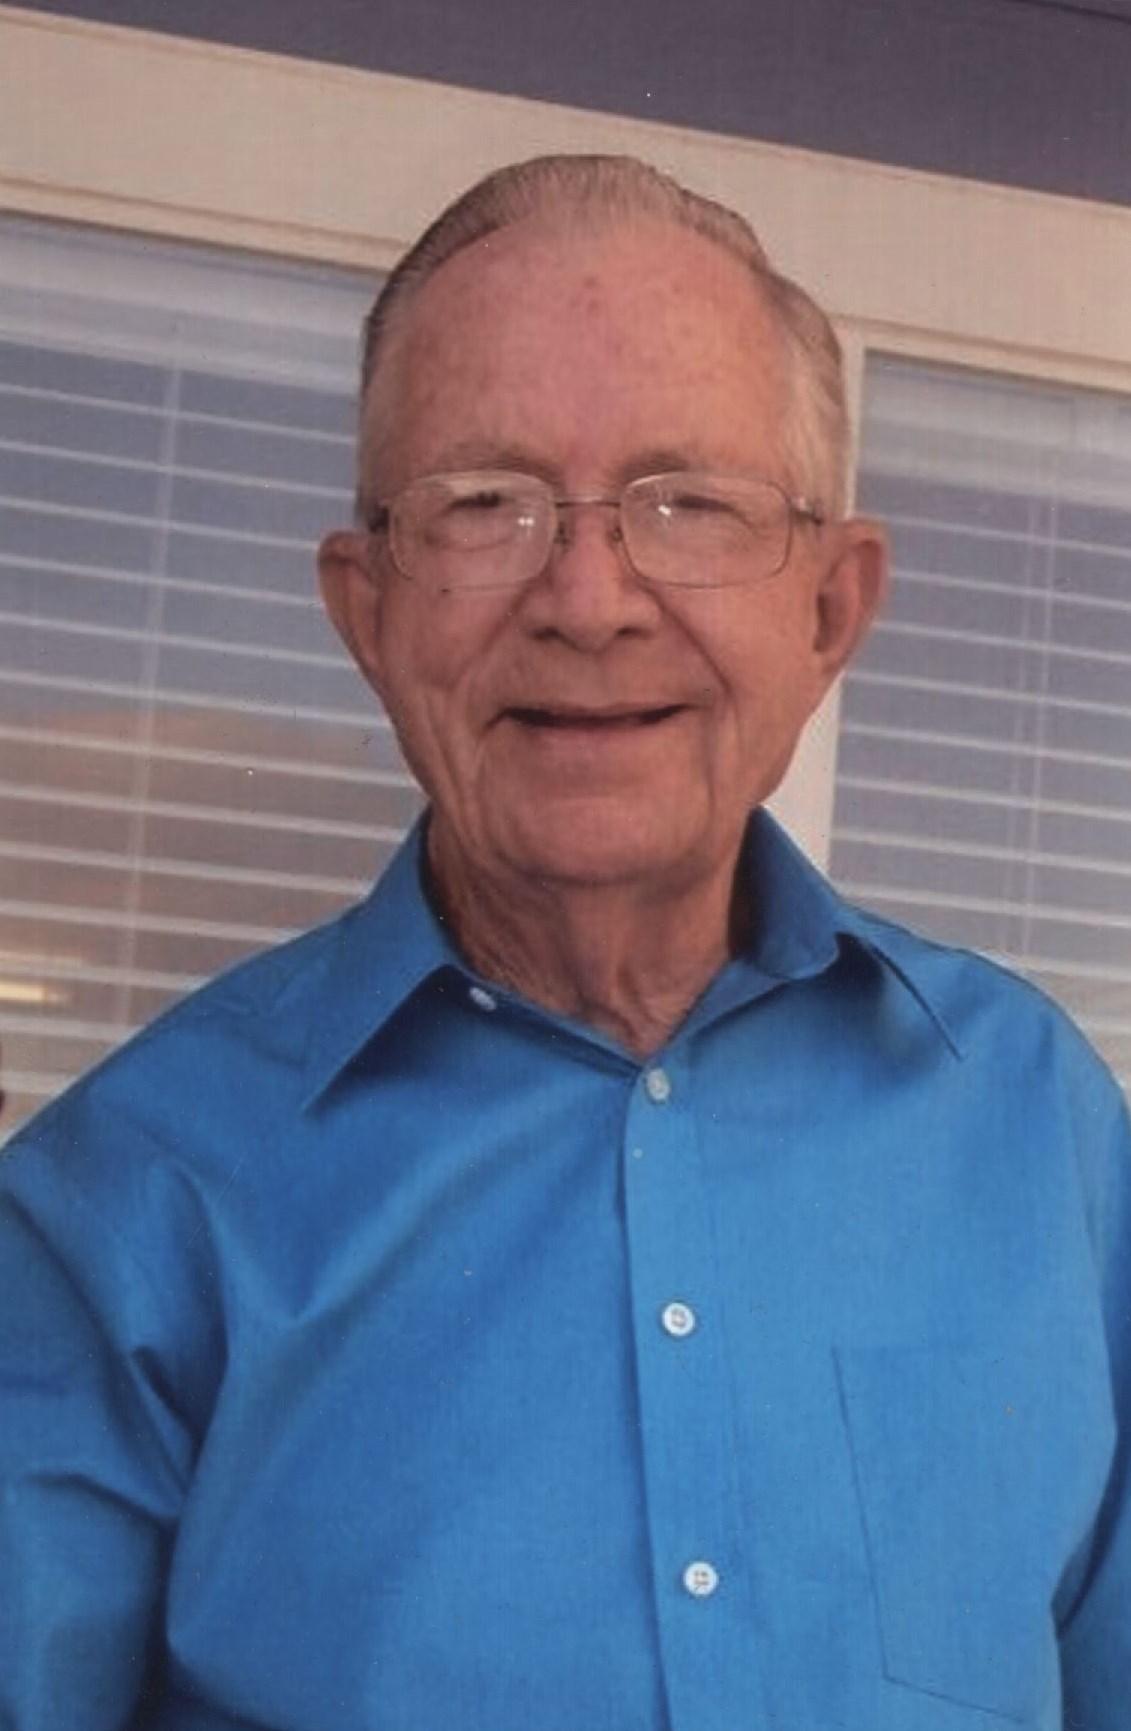 Allene Simmons tillman simmons obituary - montgomery, al